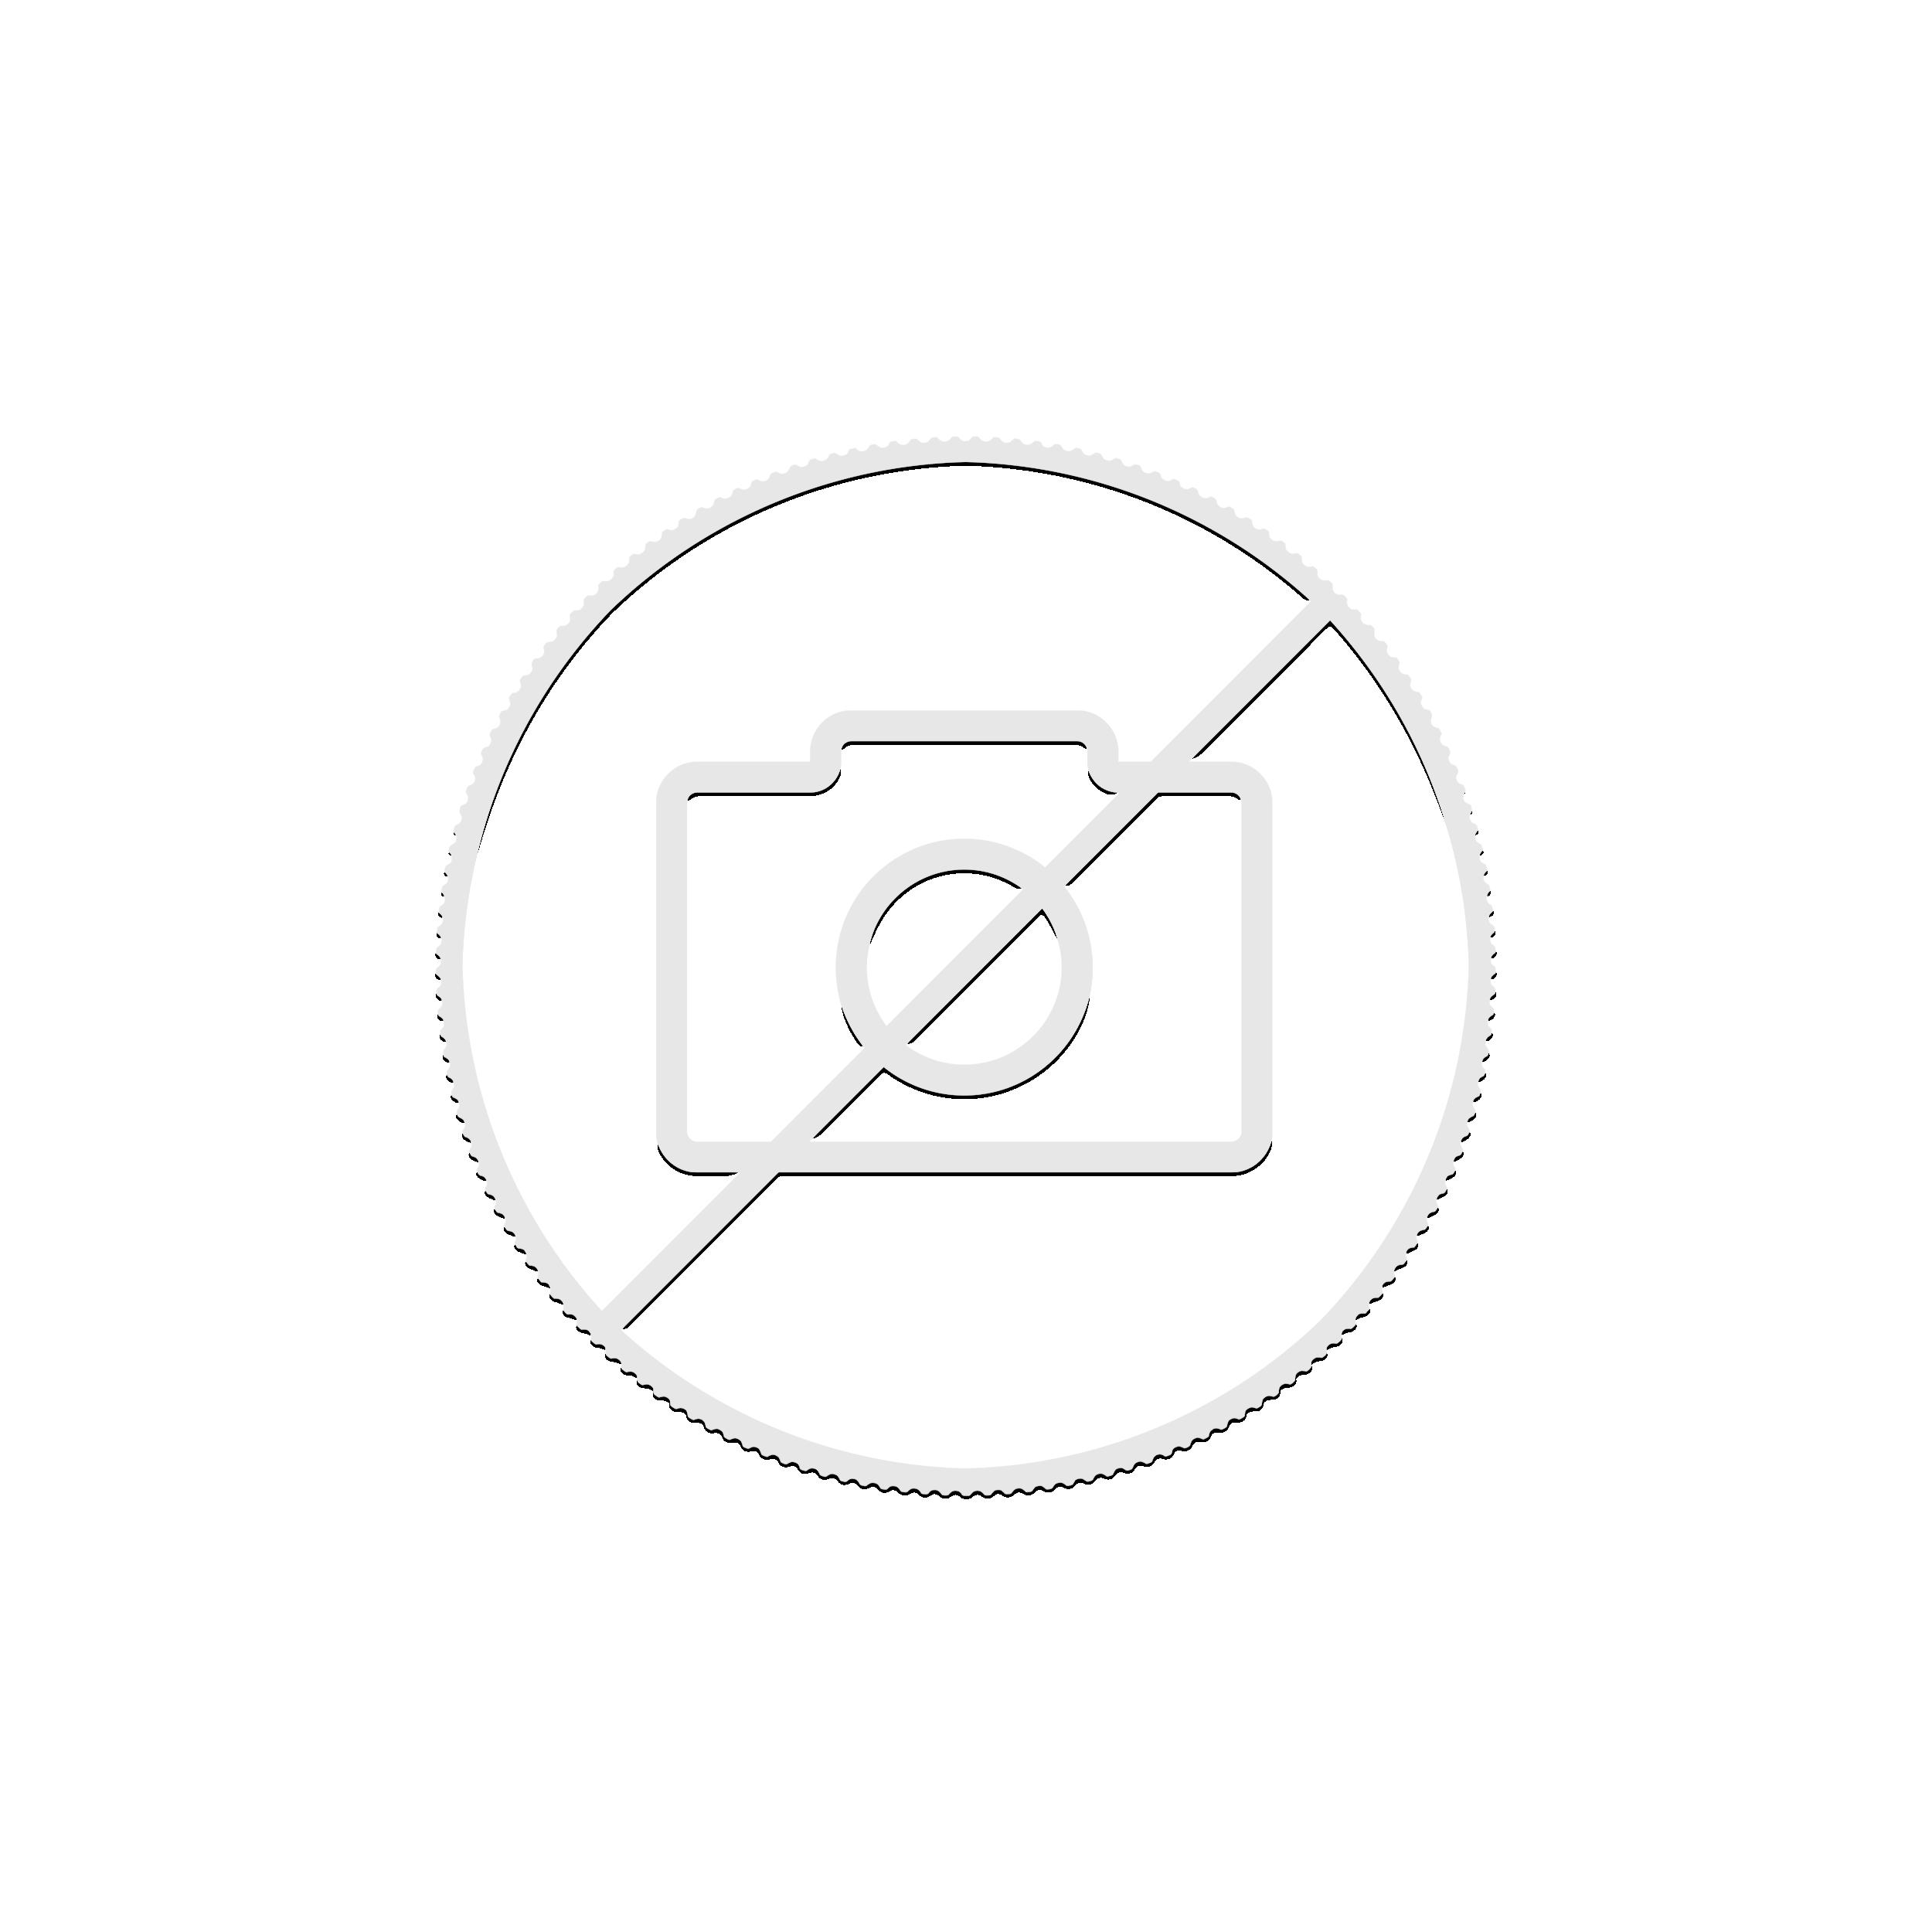 15 Gram gouden munt Panda 2019